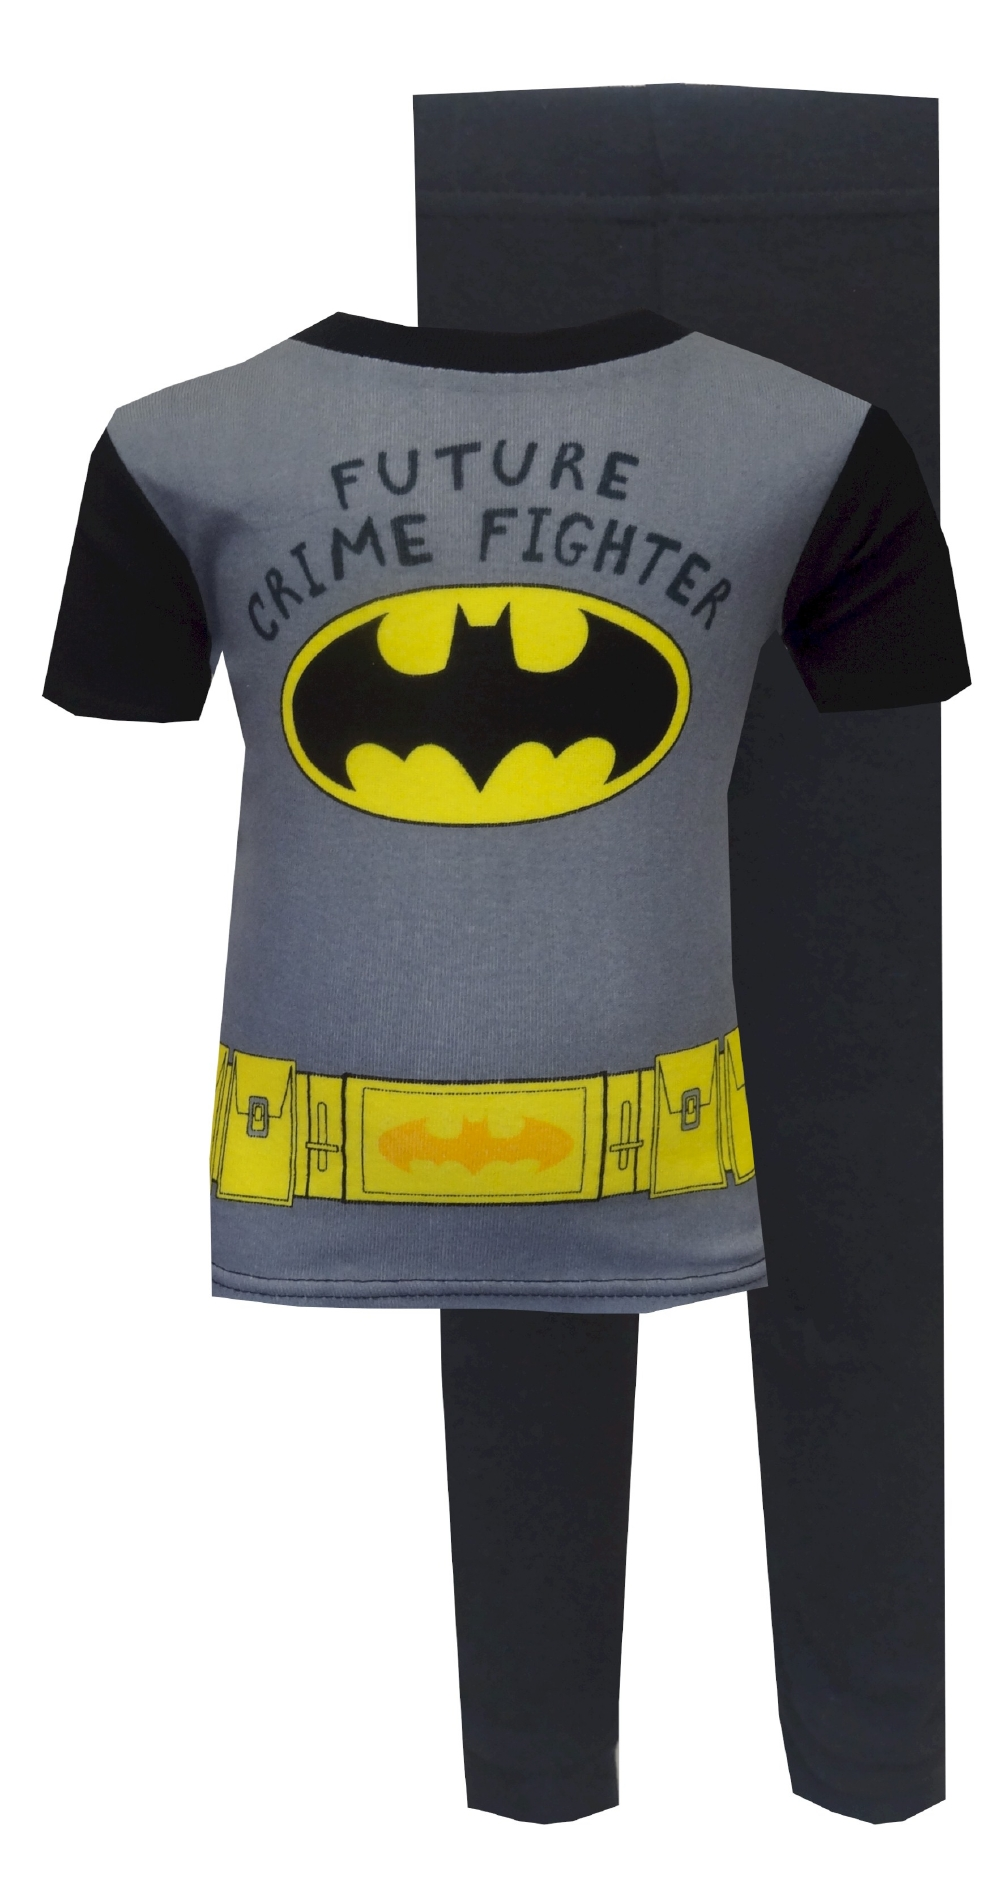 Image of DC Comics Batman Future Crime Fighter Toddler PJ for boys